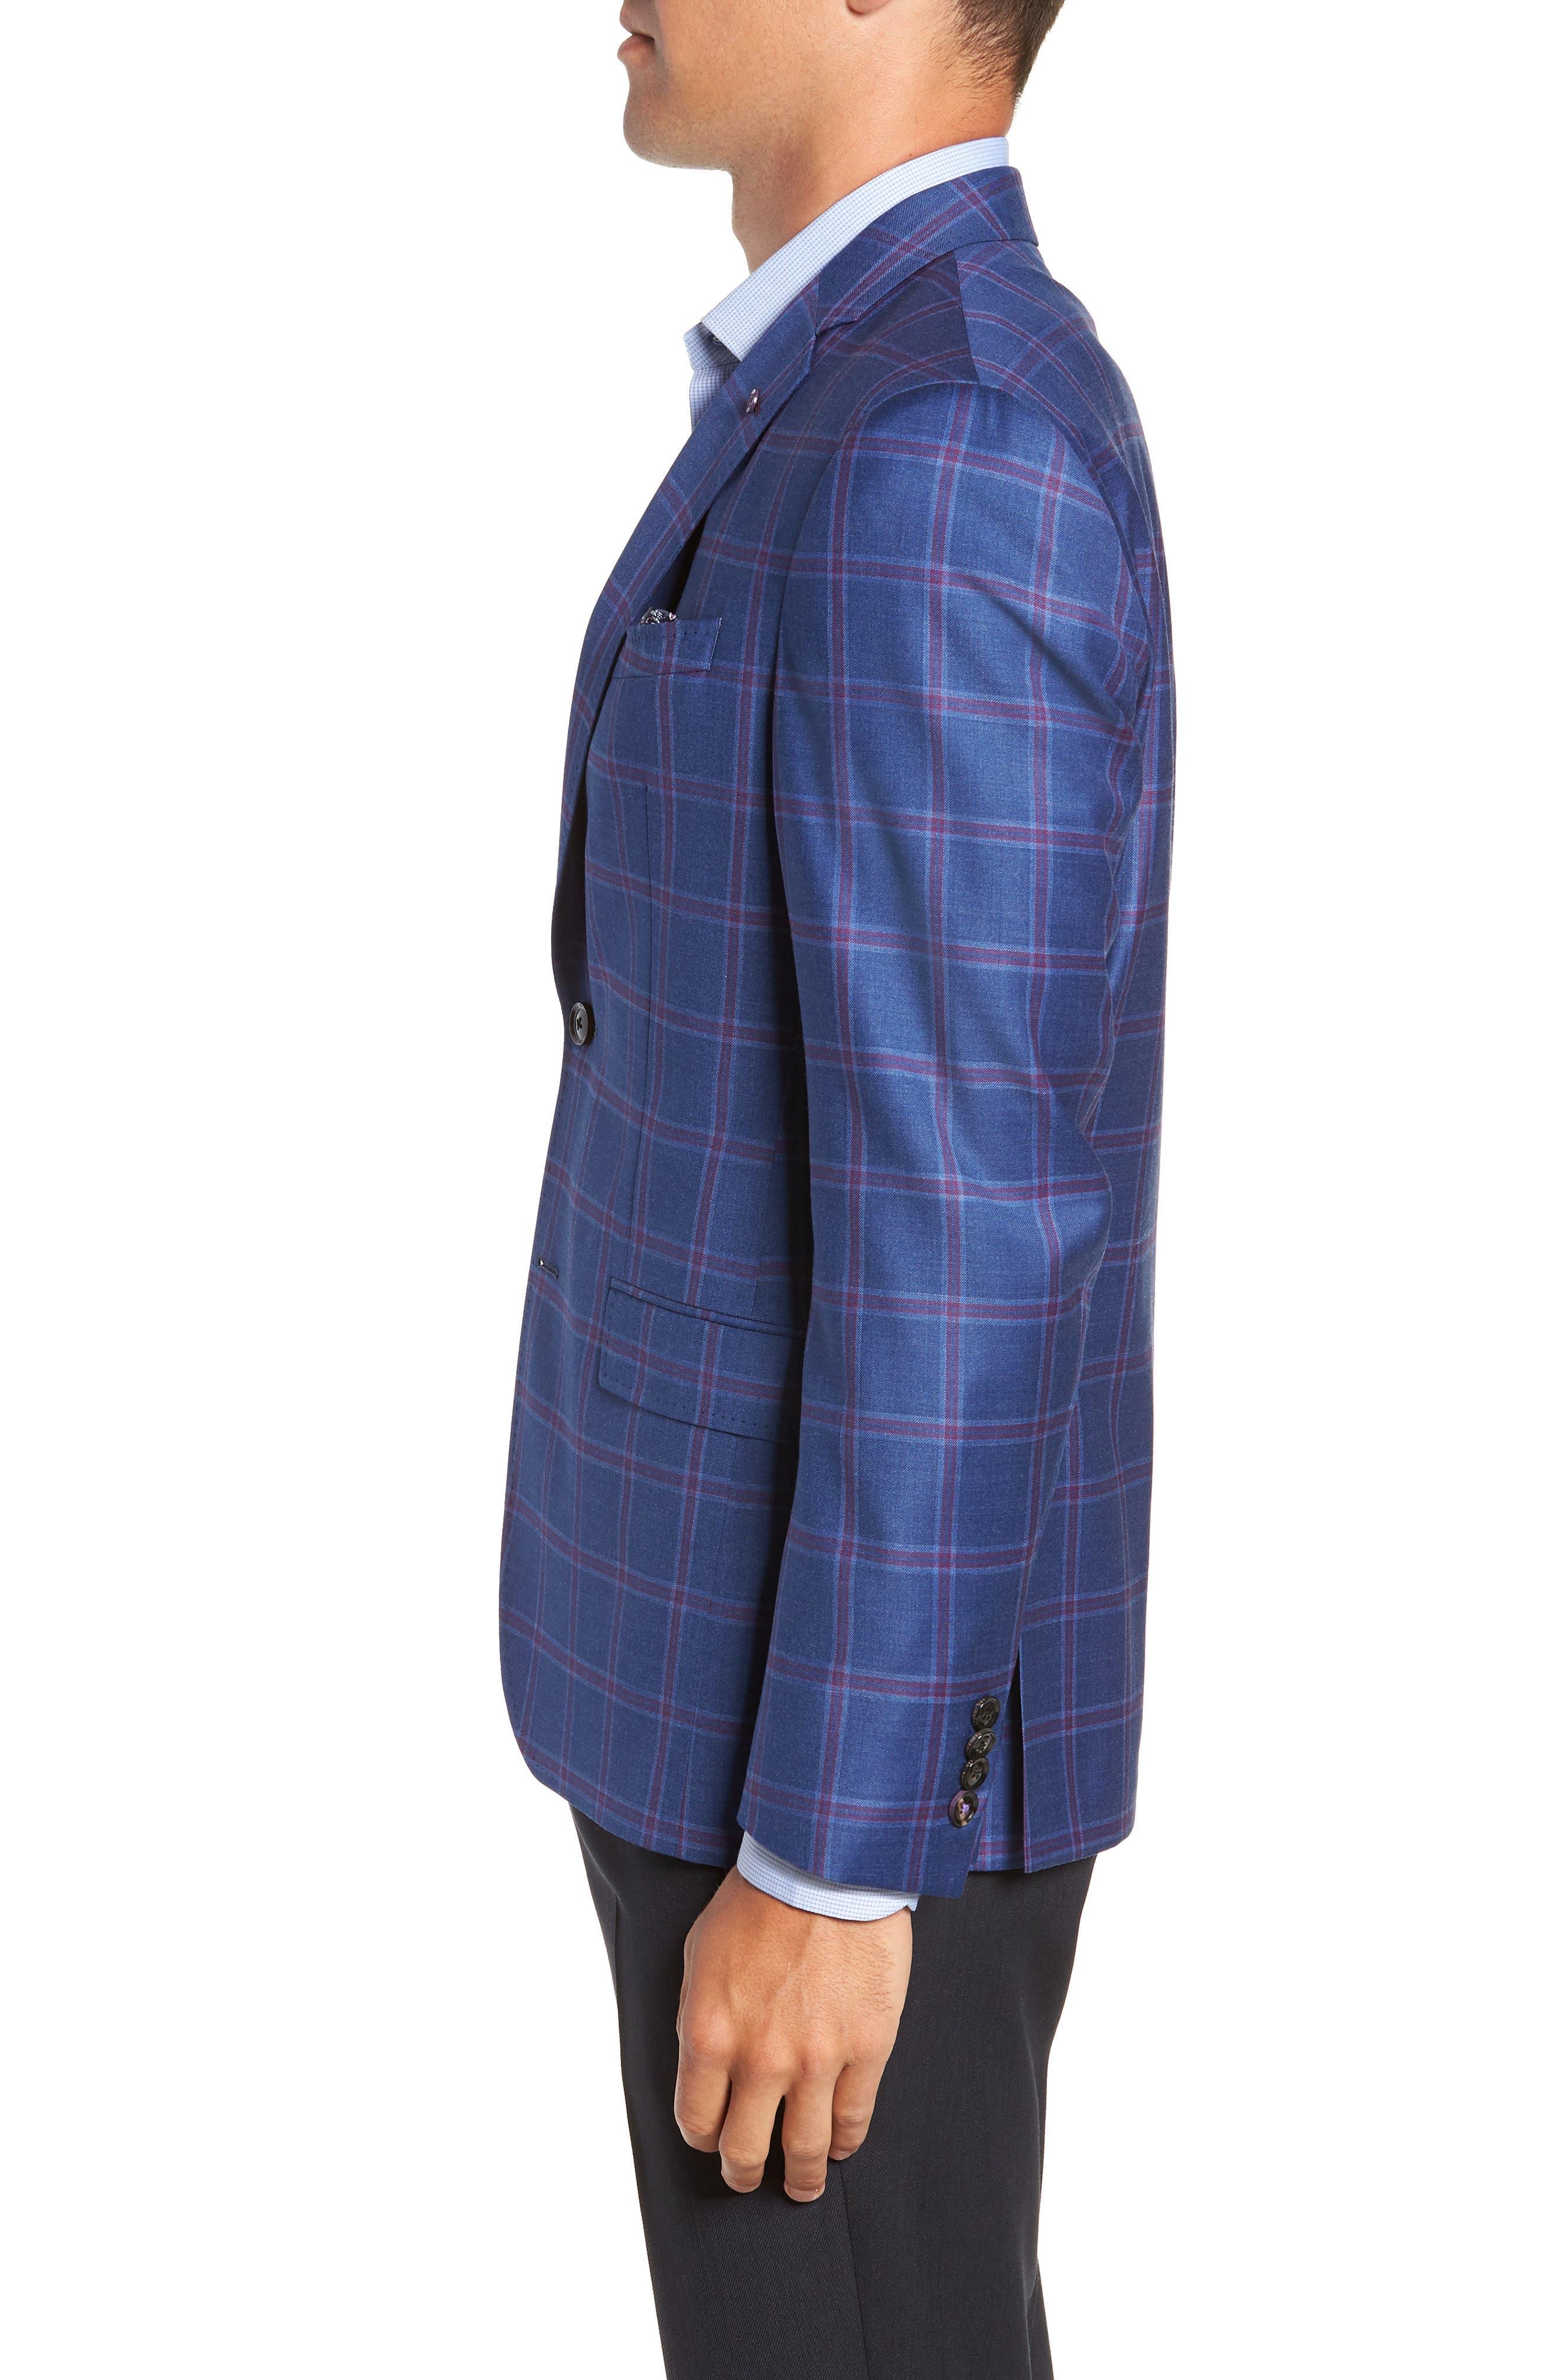 Konan Trim Fit Wool Sport Coat,                             Alternate thumbnail 3, color,                             BLUE